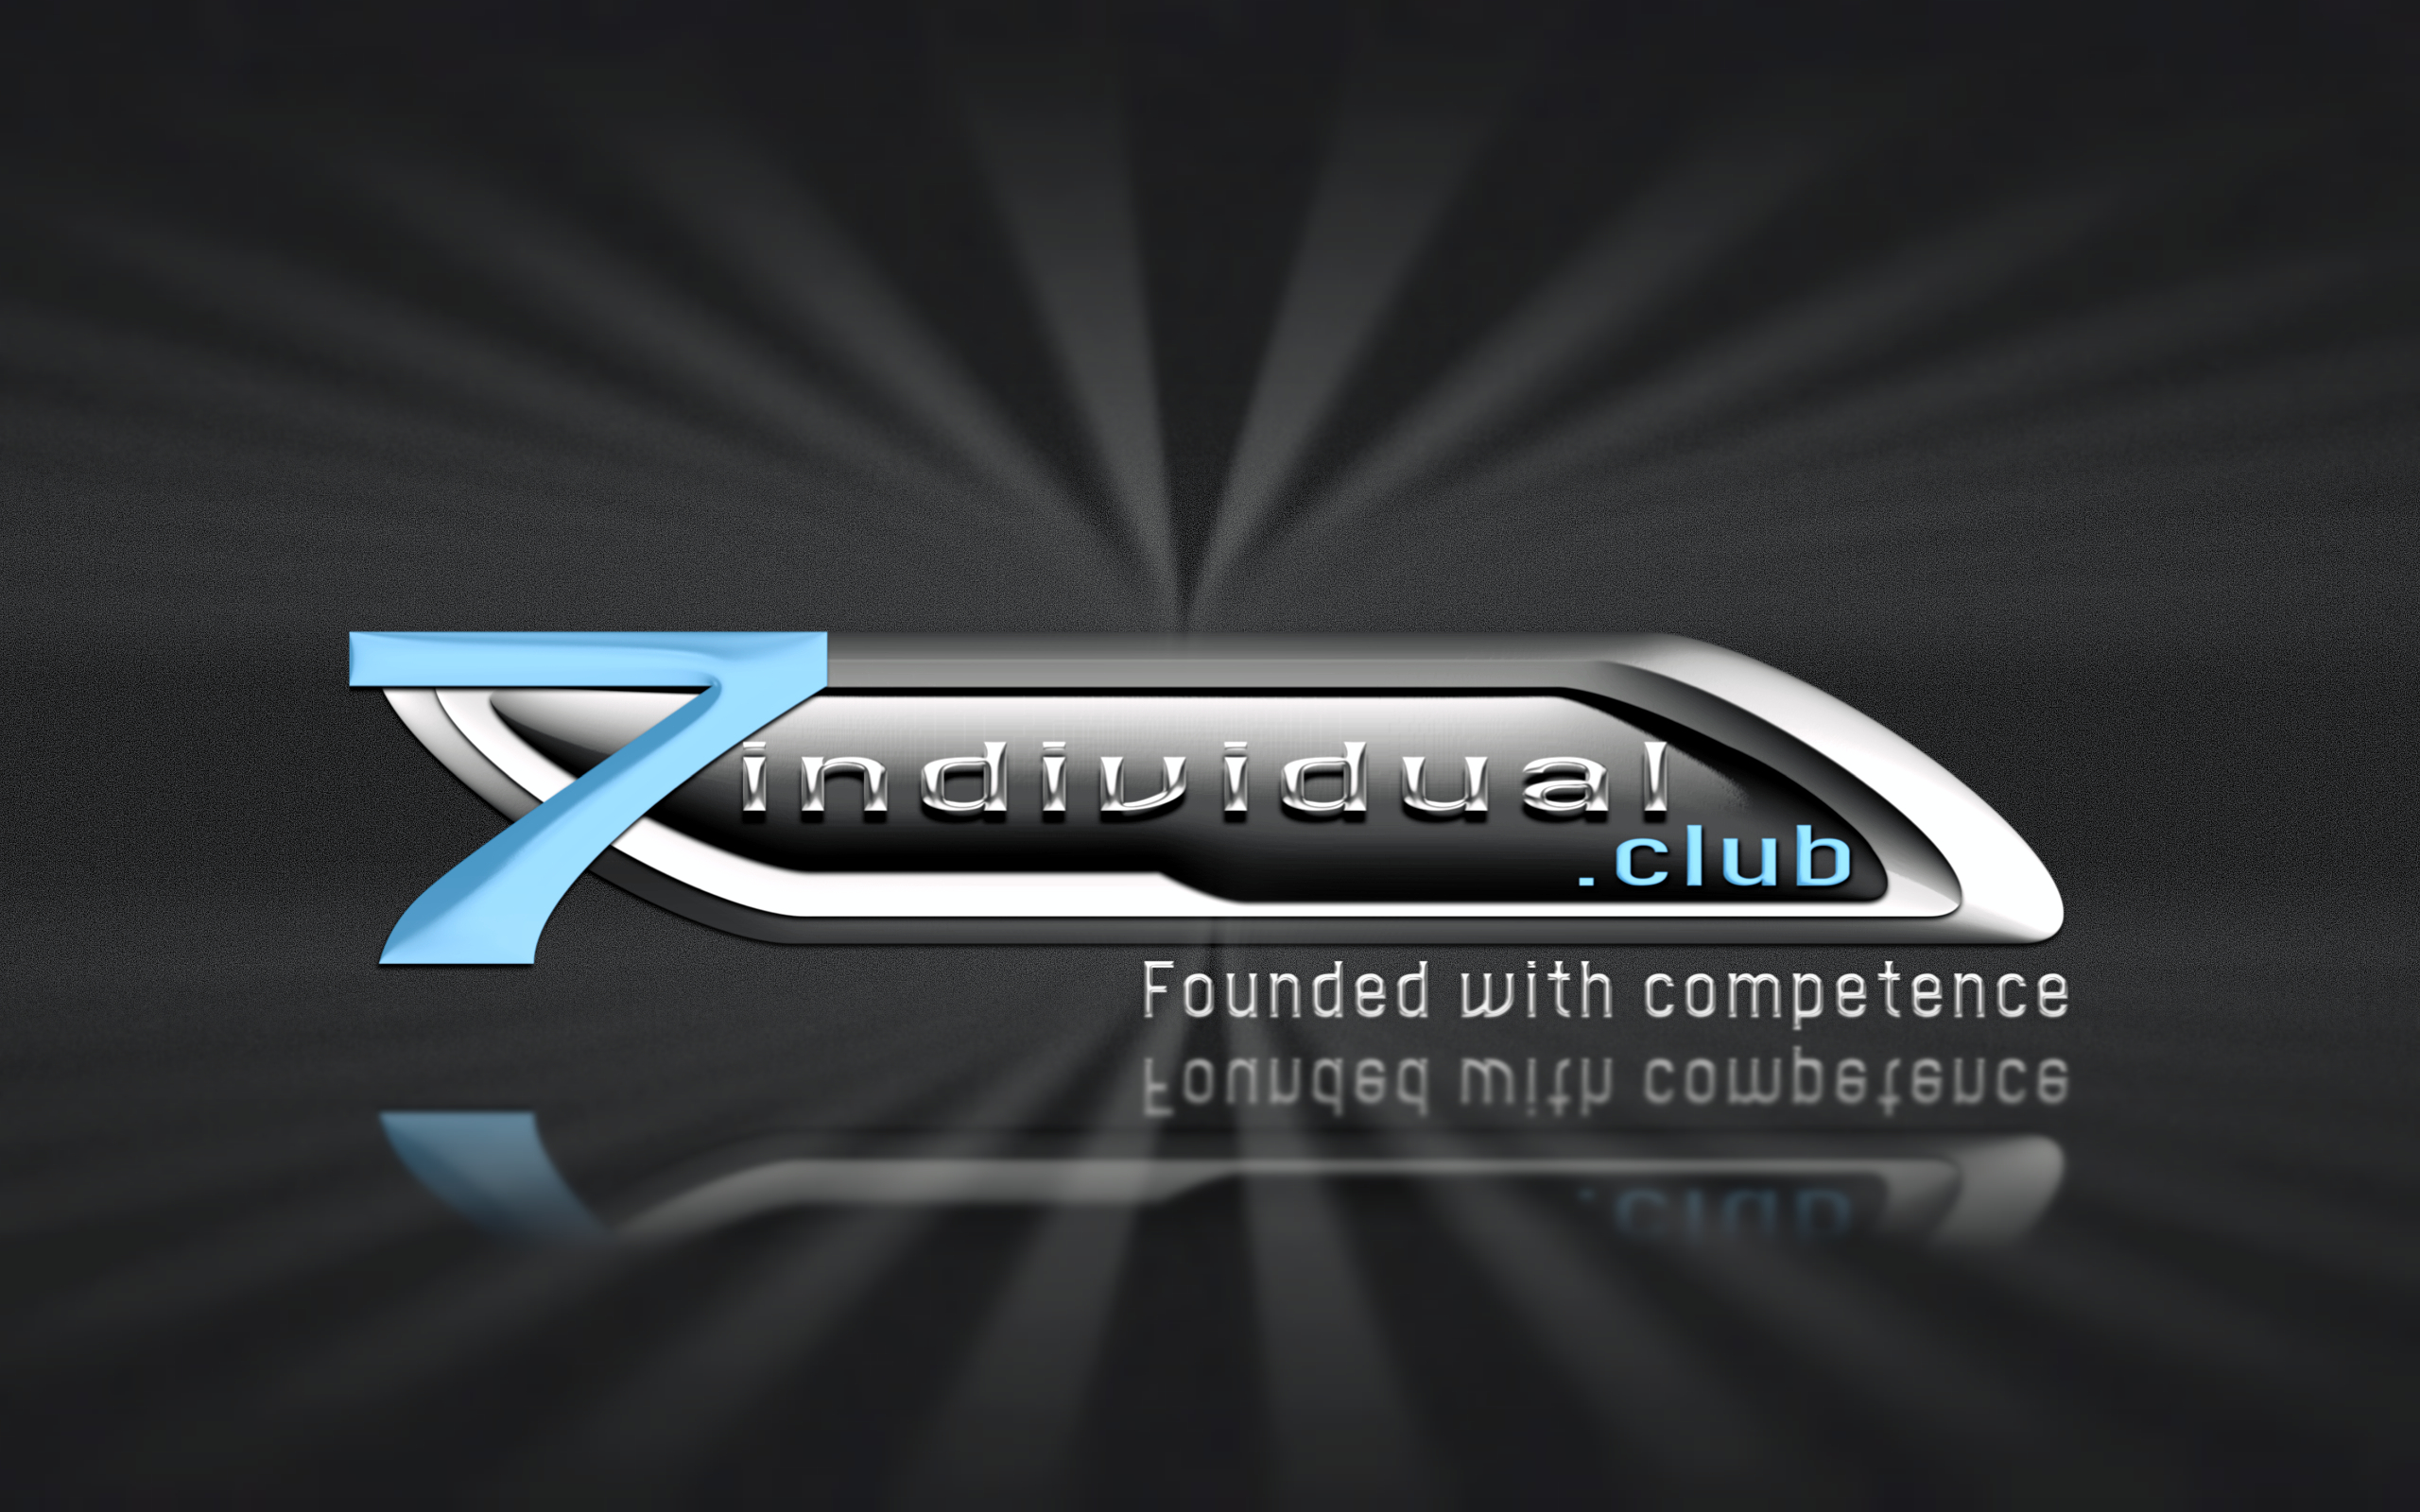 7-individual.club